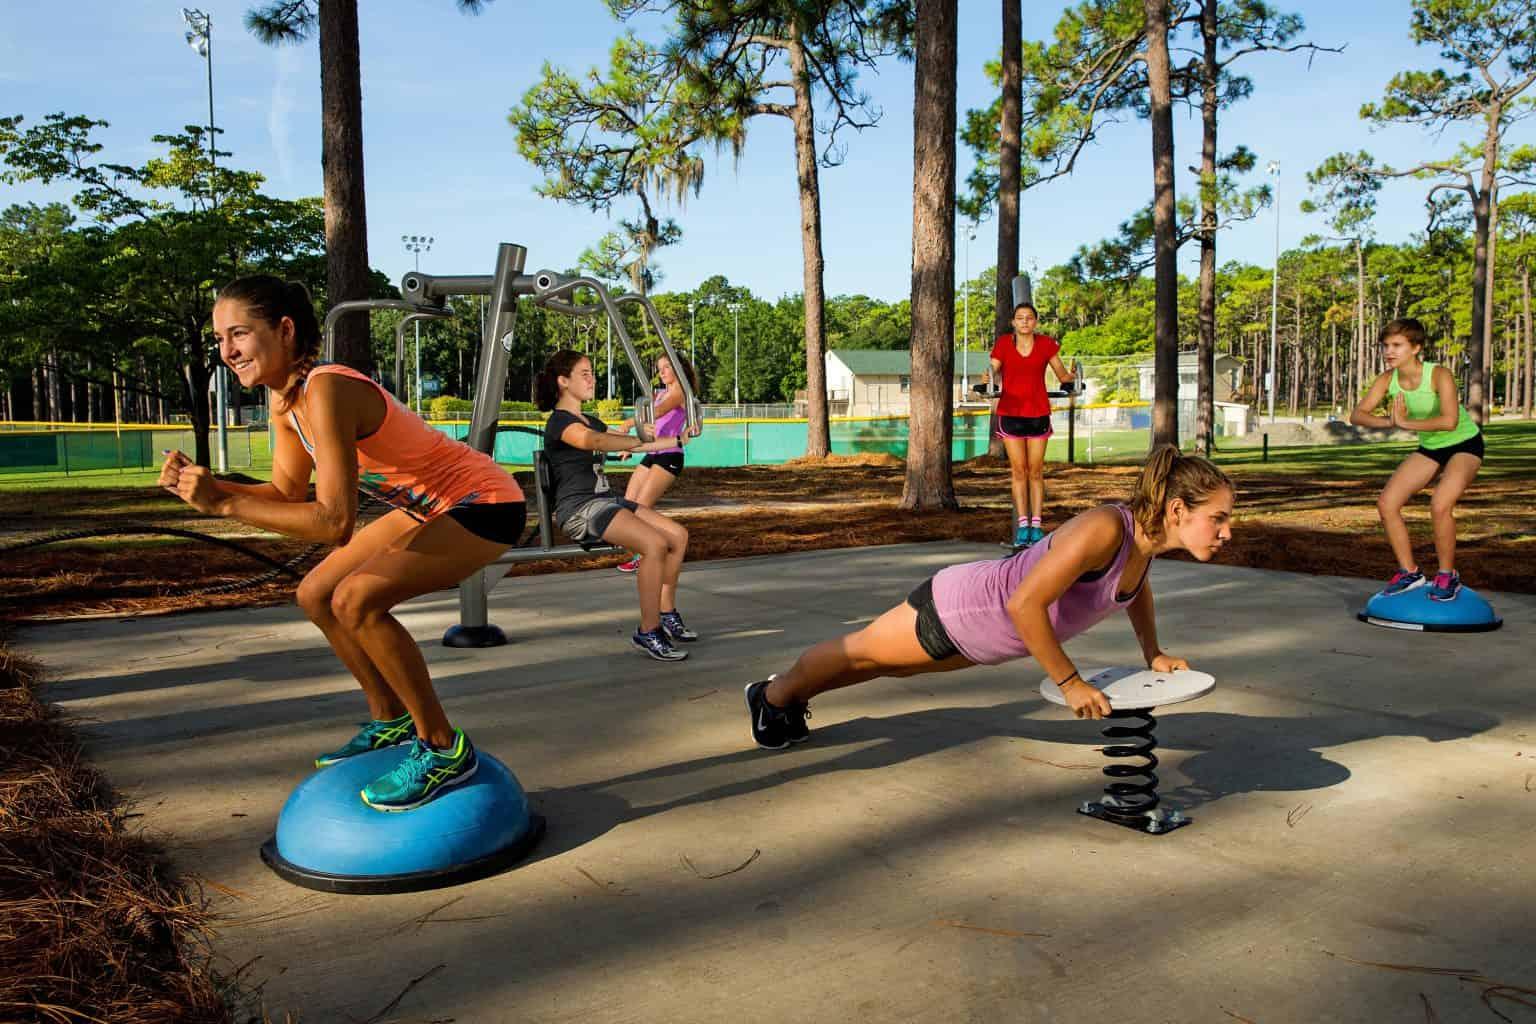 outdoor-fitness-equipment_49643793656_o-1536x1024